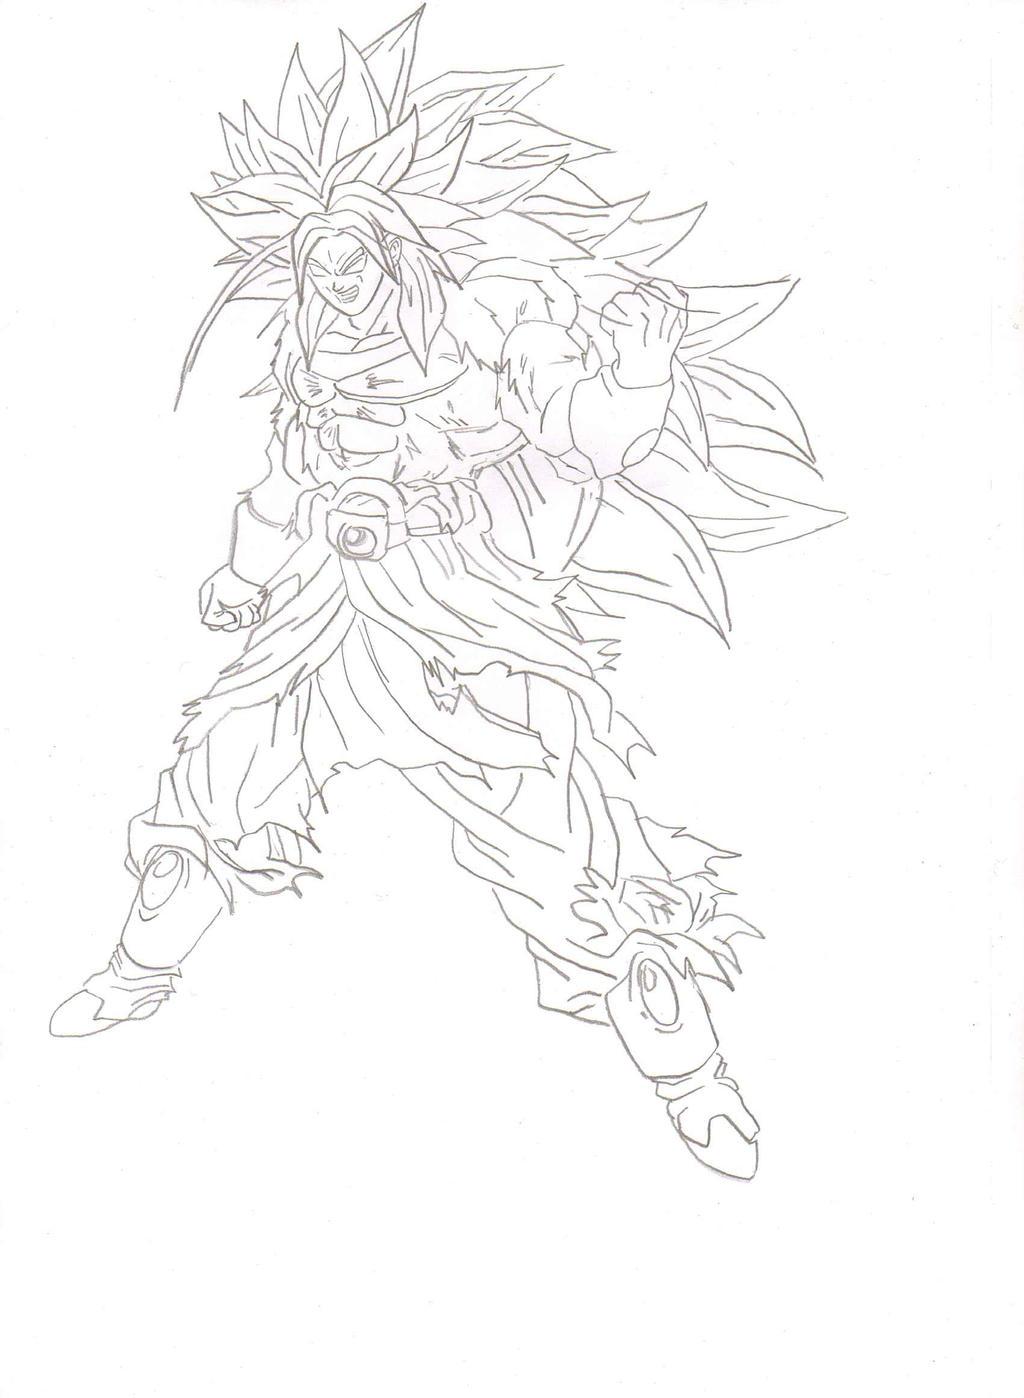 Super Saiyan 5 Broly By Ozbushido